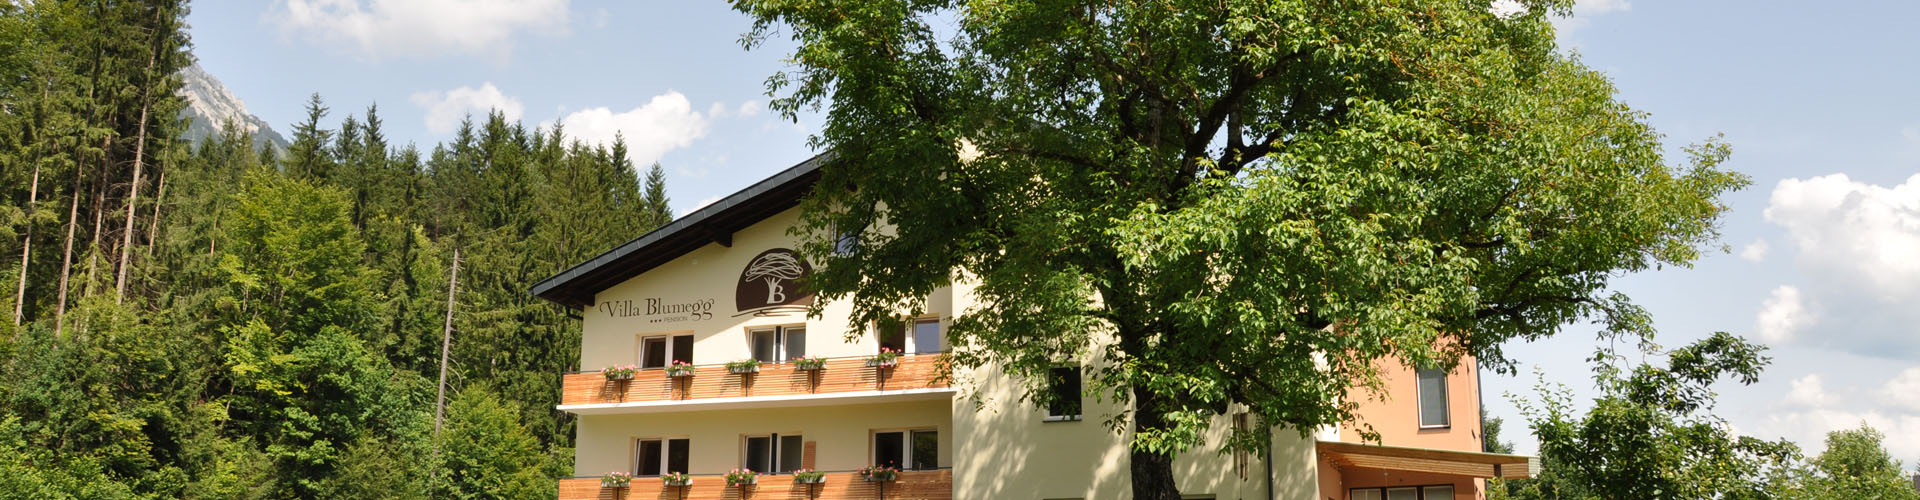 garten-berge-hotel-pension-sommer